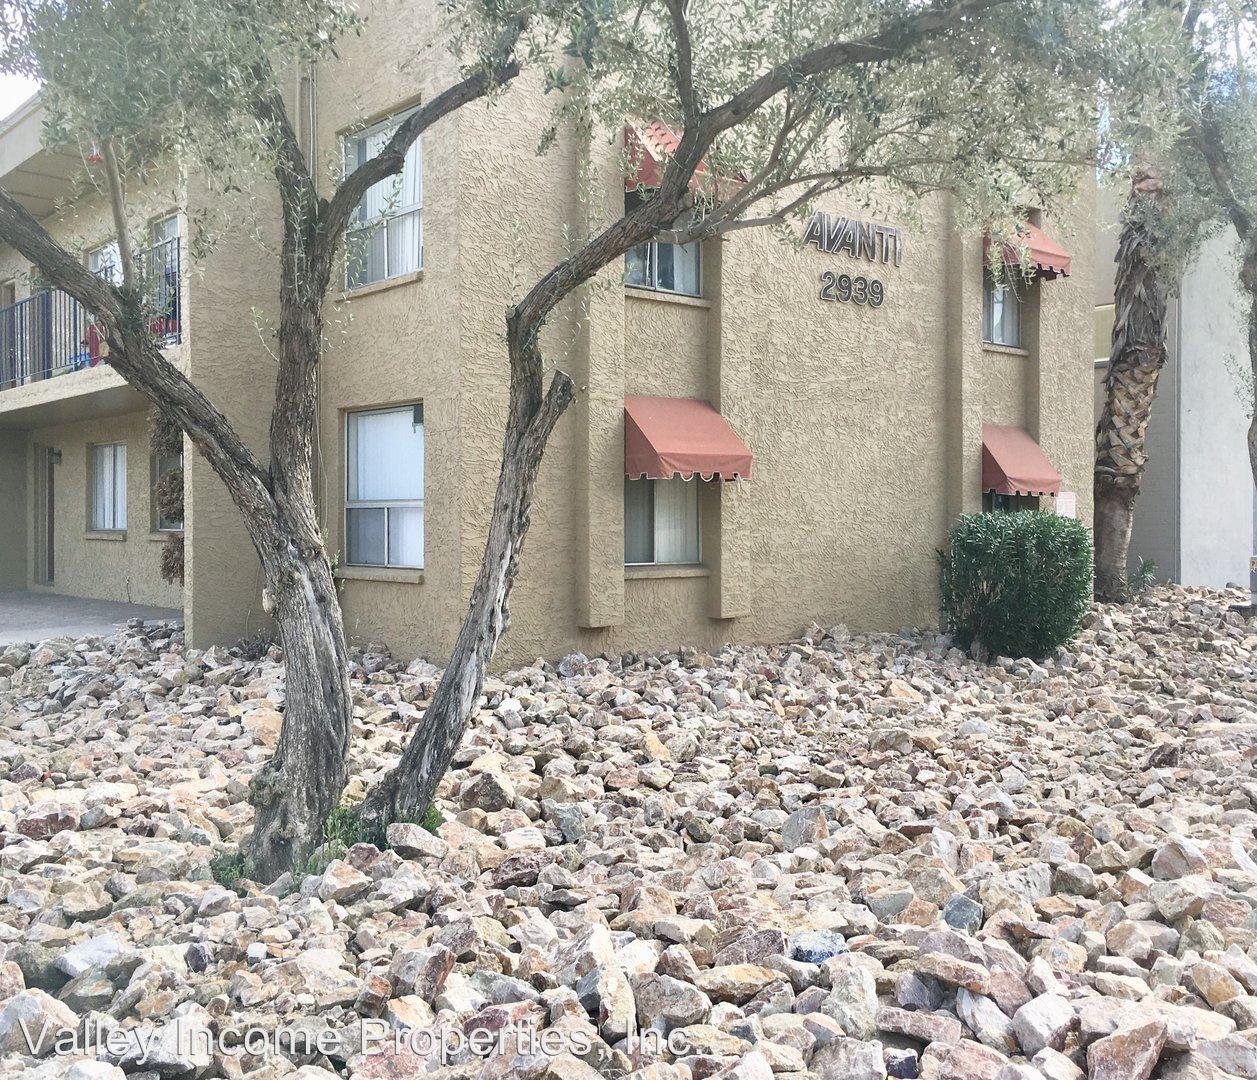 Avanti Apartments of Arcadia